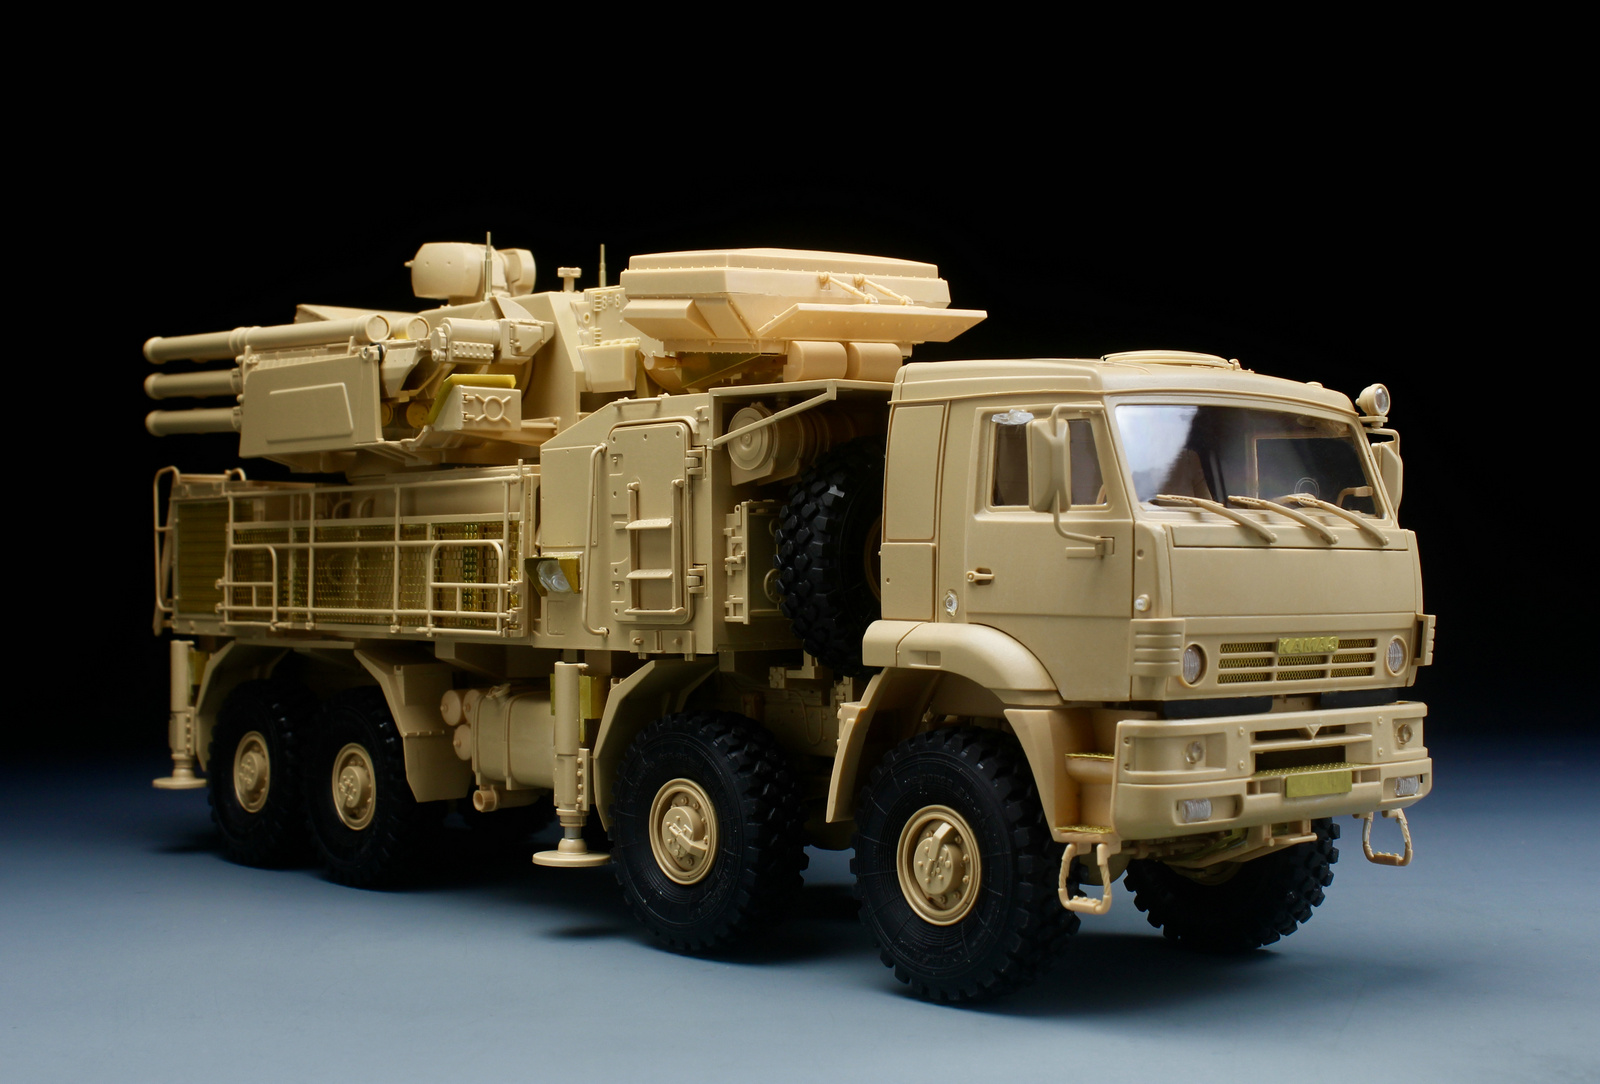 Tiger Model Russian  Pantsir-S1/ Sa-22 - Tiger Model - Scale 1/35 - TIGE4644